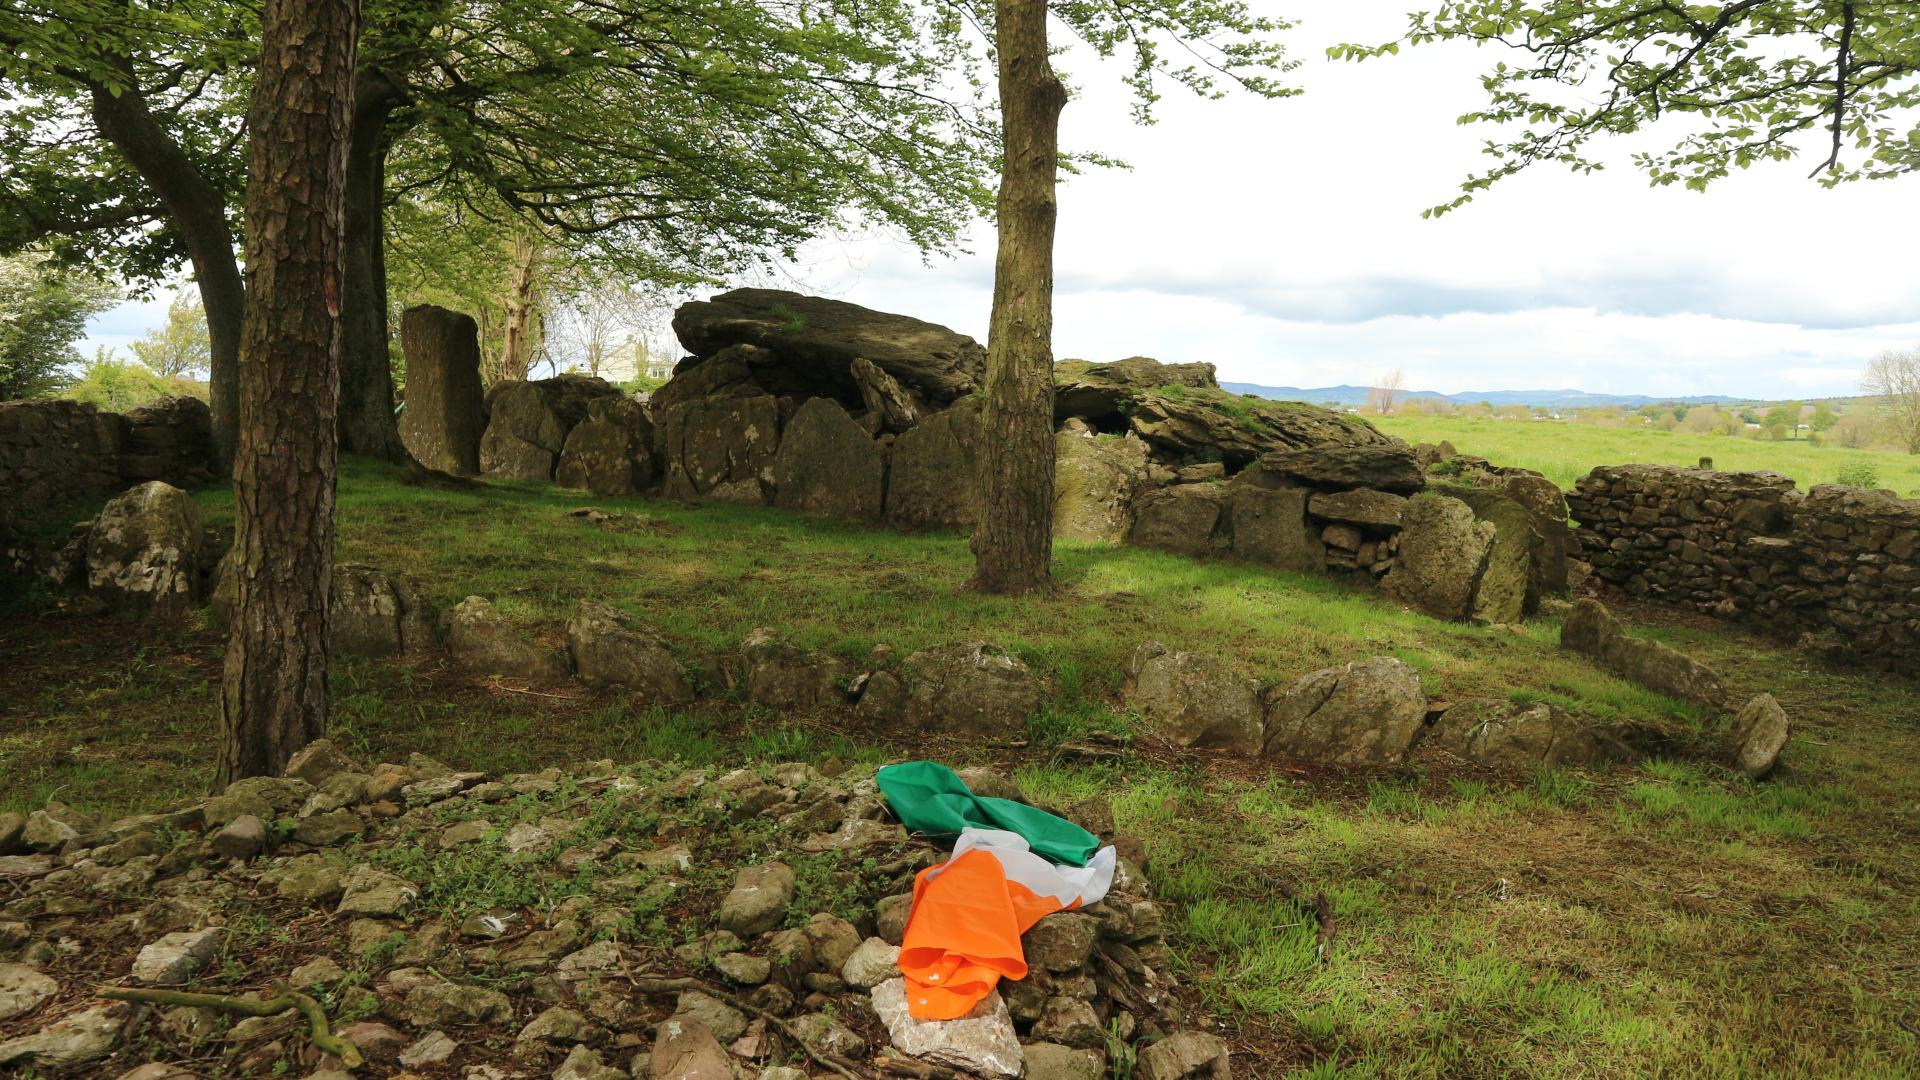 Leaba Cailleach - Witch's Grave. Photo Anne Marie Devlin